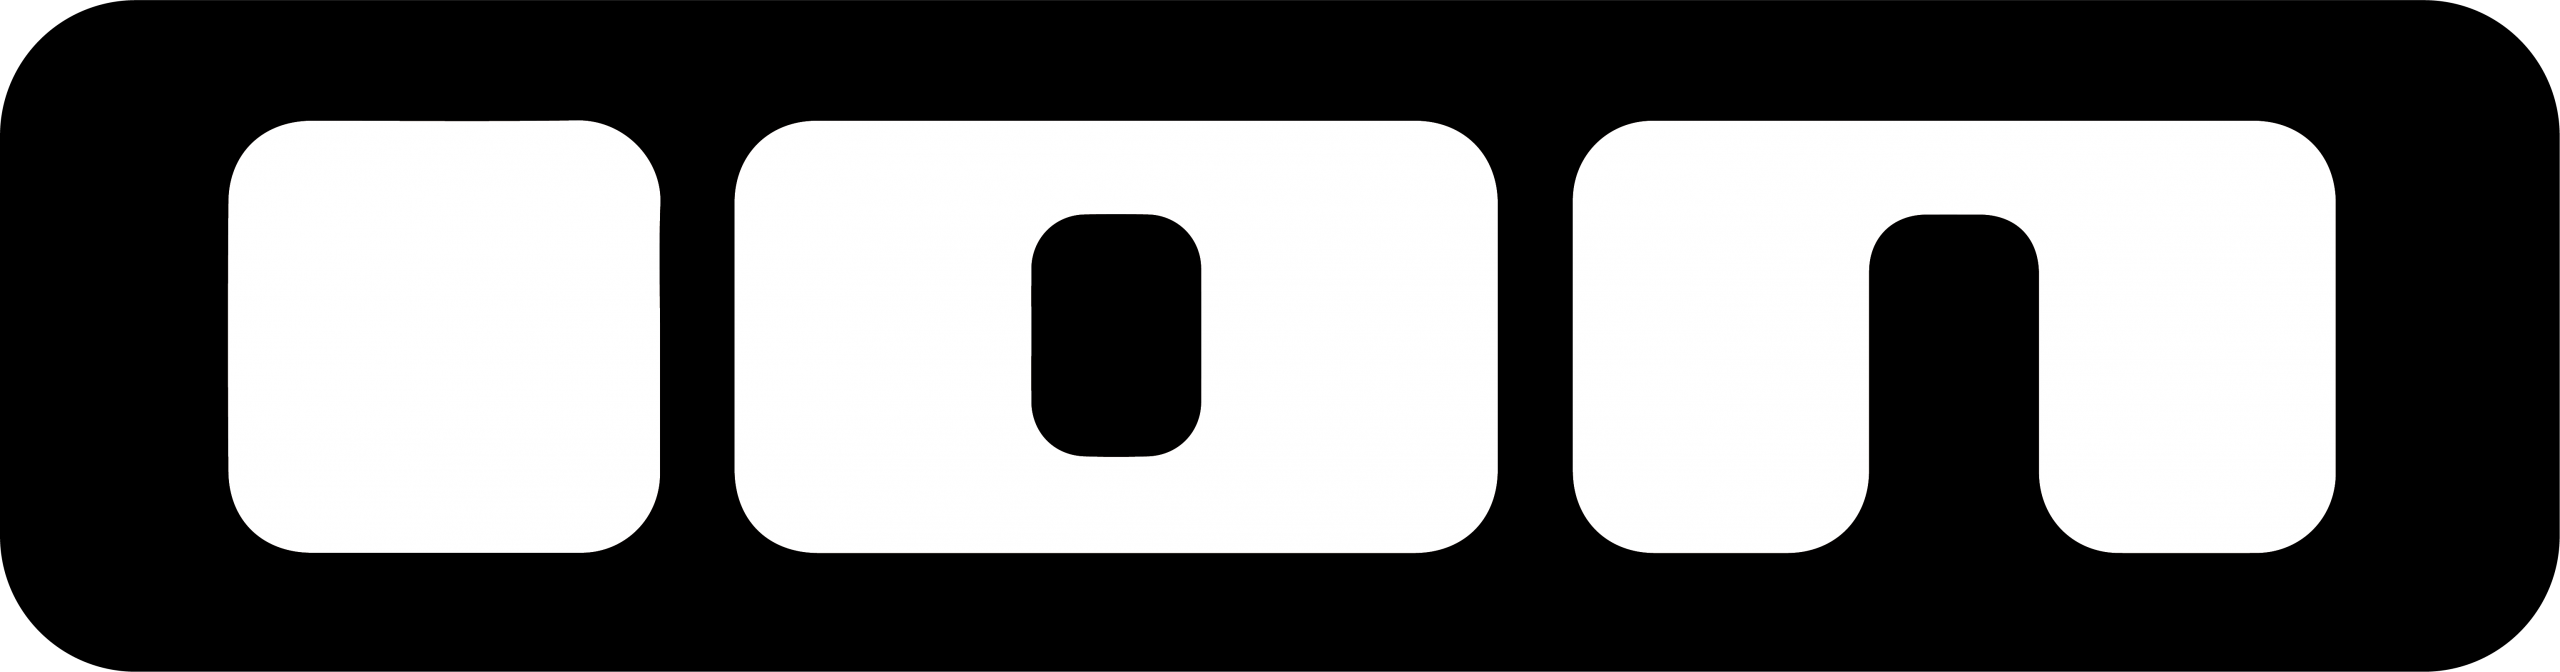 logo-ion-nero-02